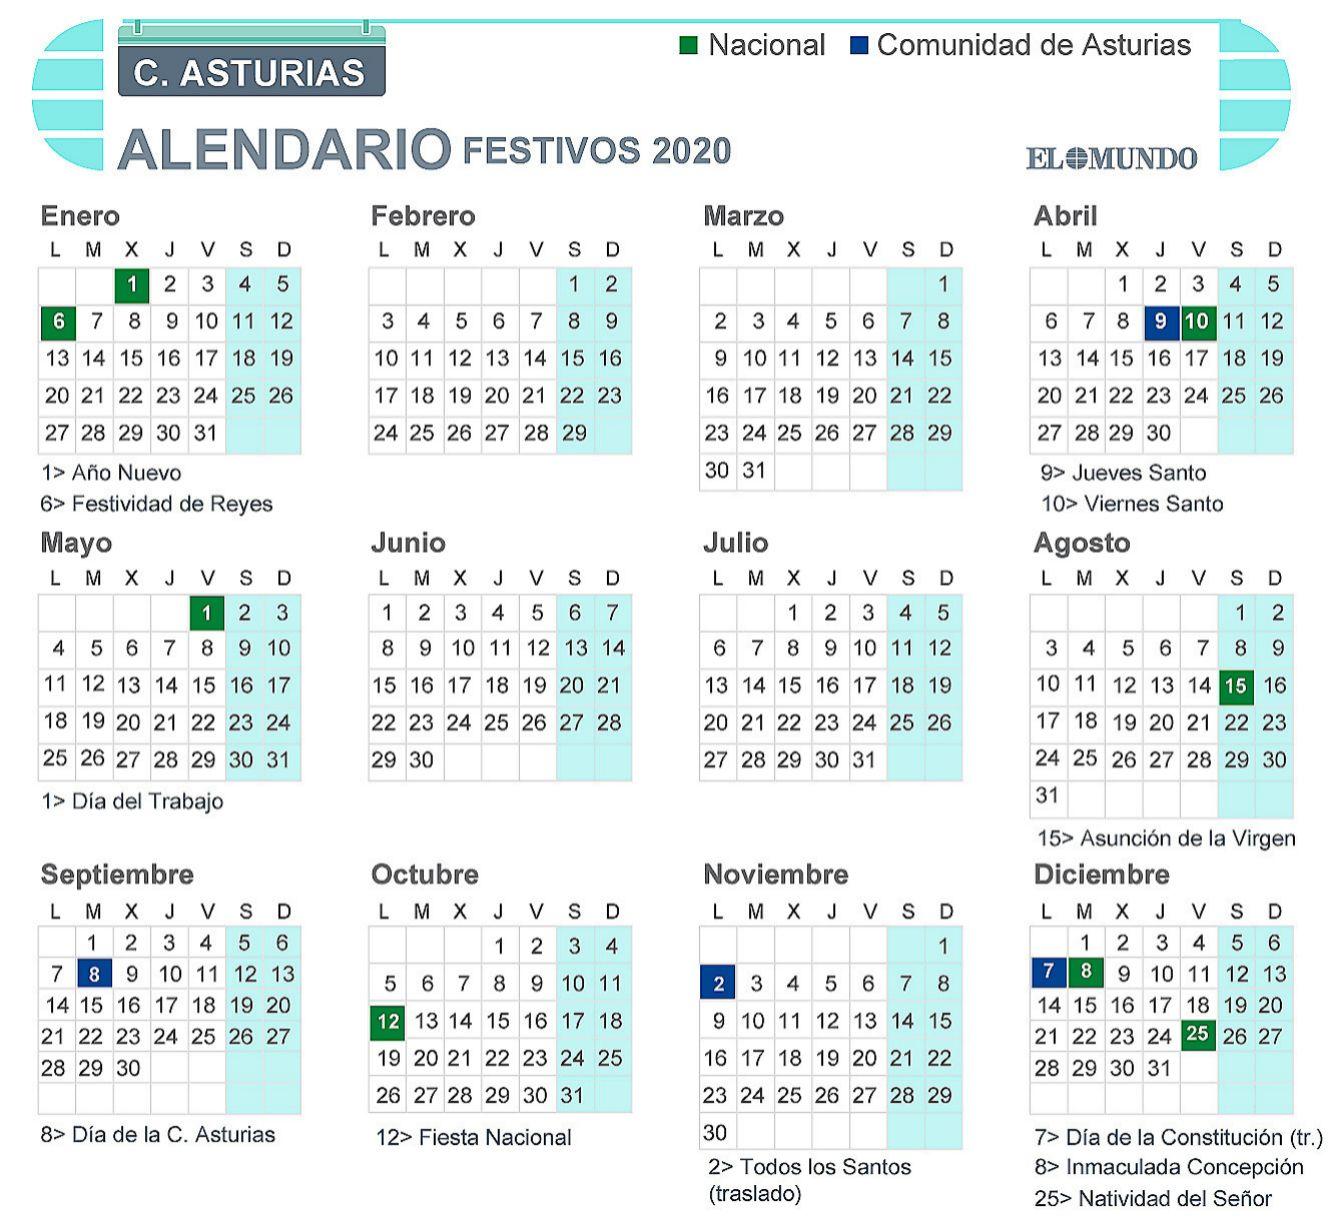 Calendario laboral de Asturias 2020